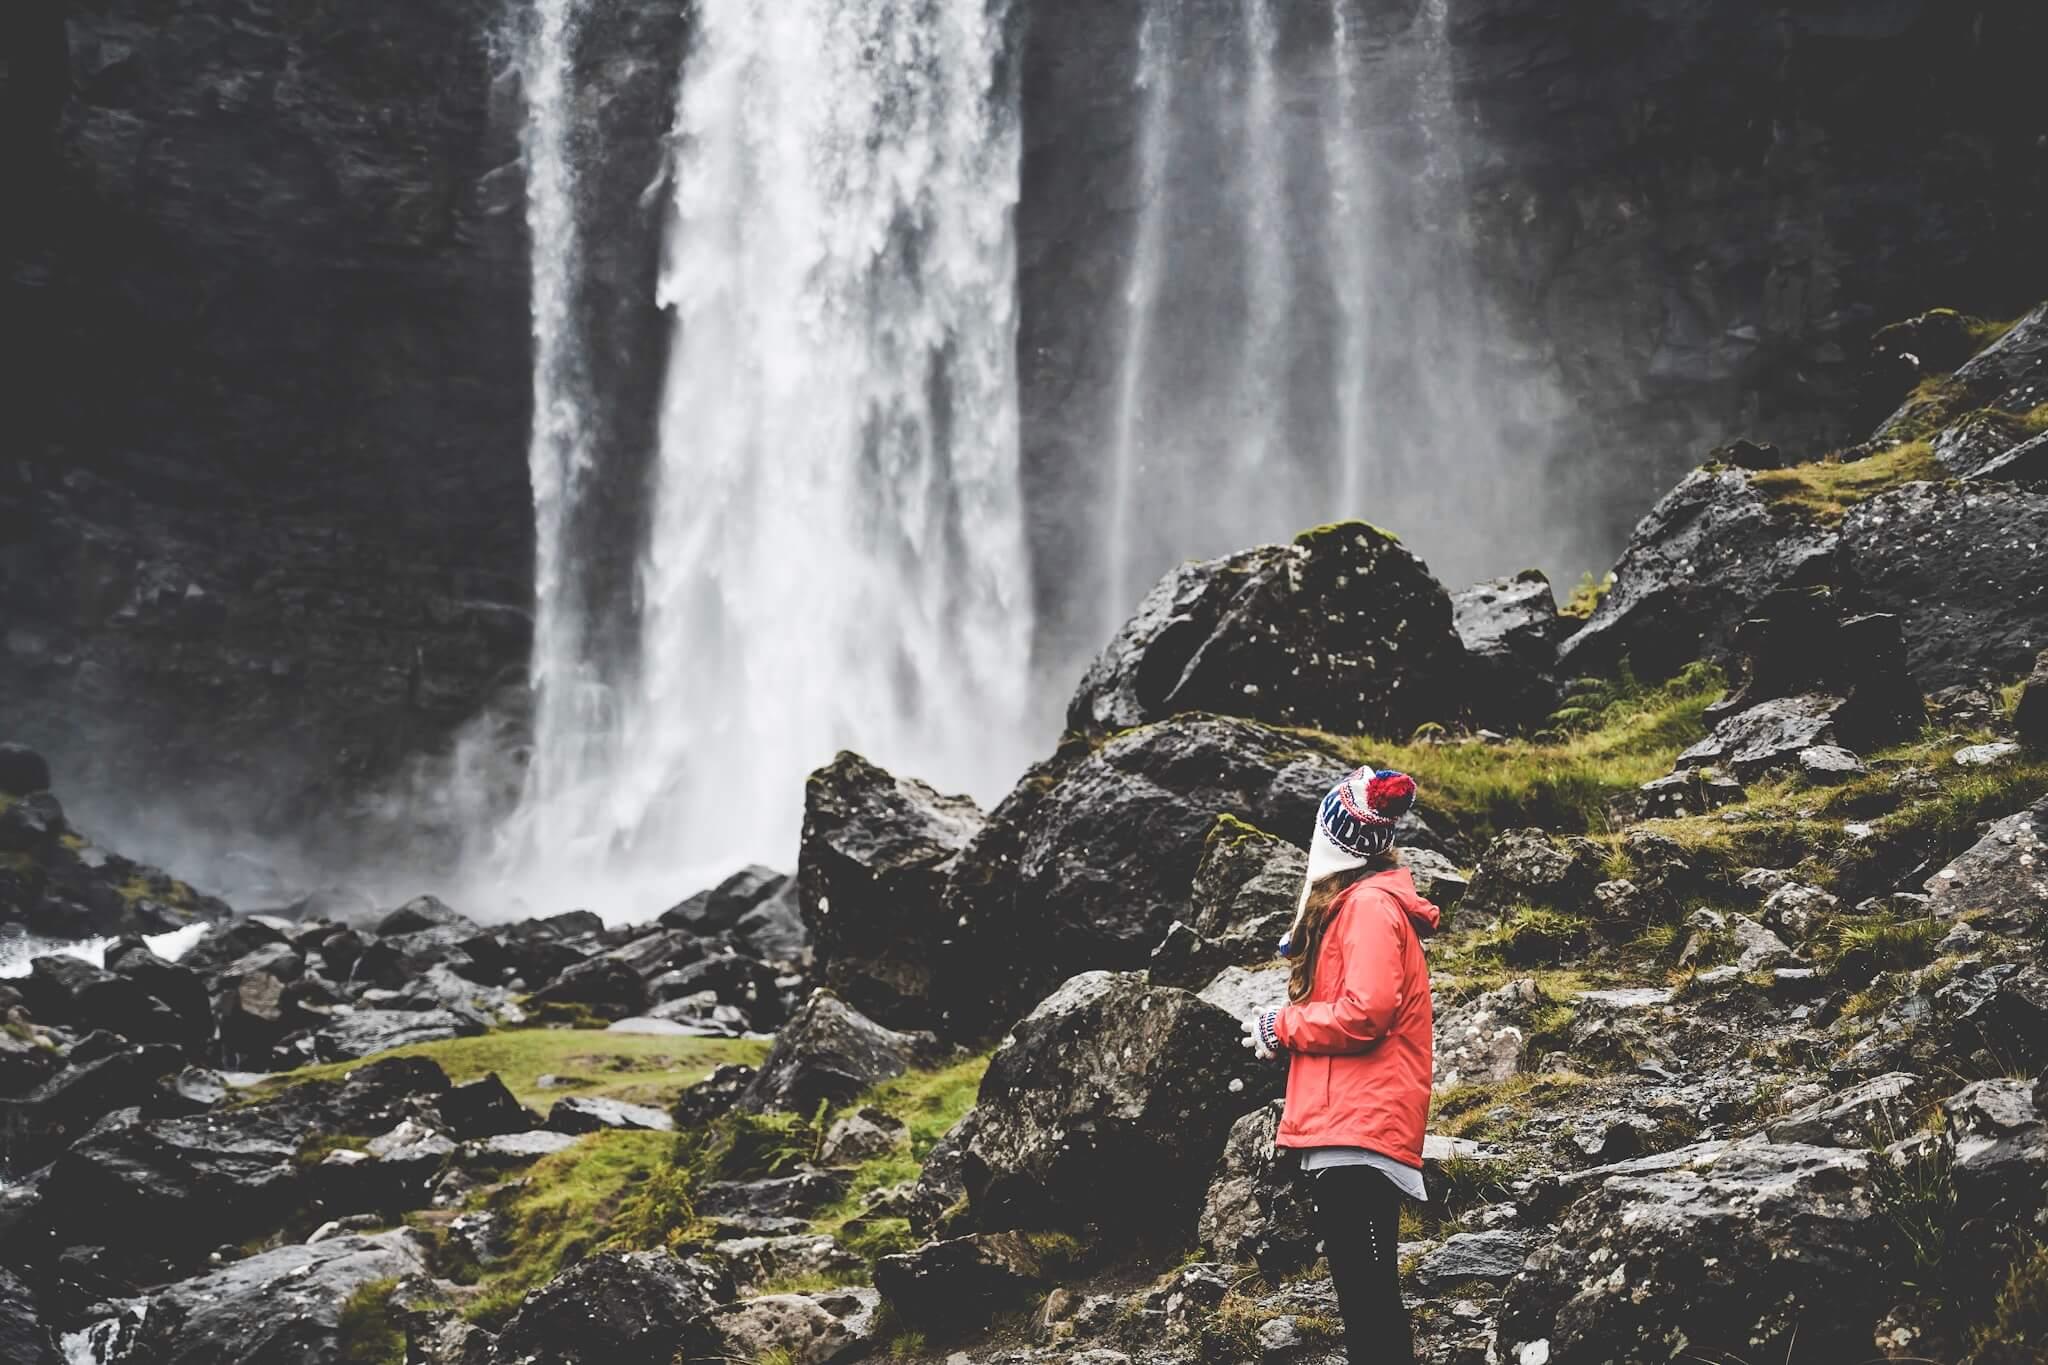 Faroeisland-Road-Trip_blog_nikon_dji_faroeisland_mounten_folkgreen00007 🇫🇴Faroeisland Road Trip🇫🇴 Blog Landscape